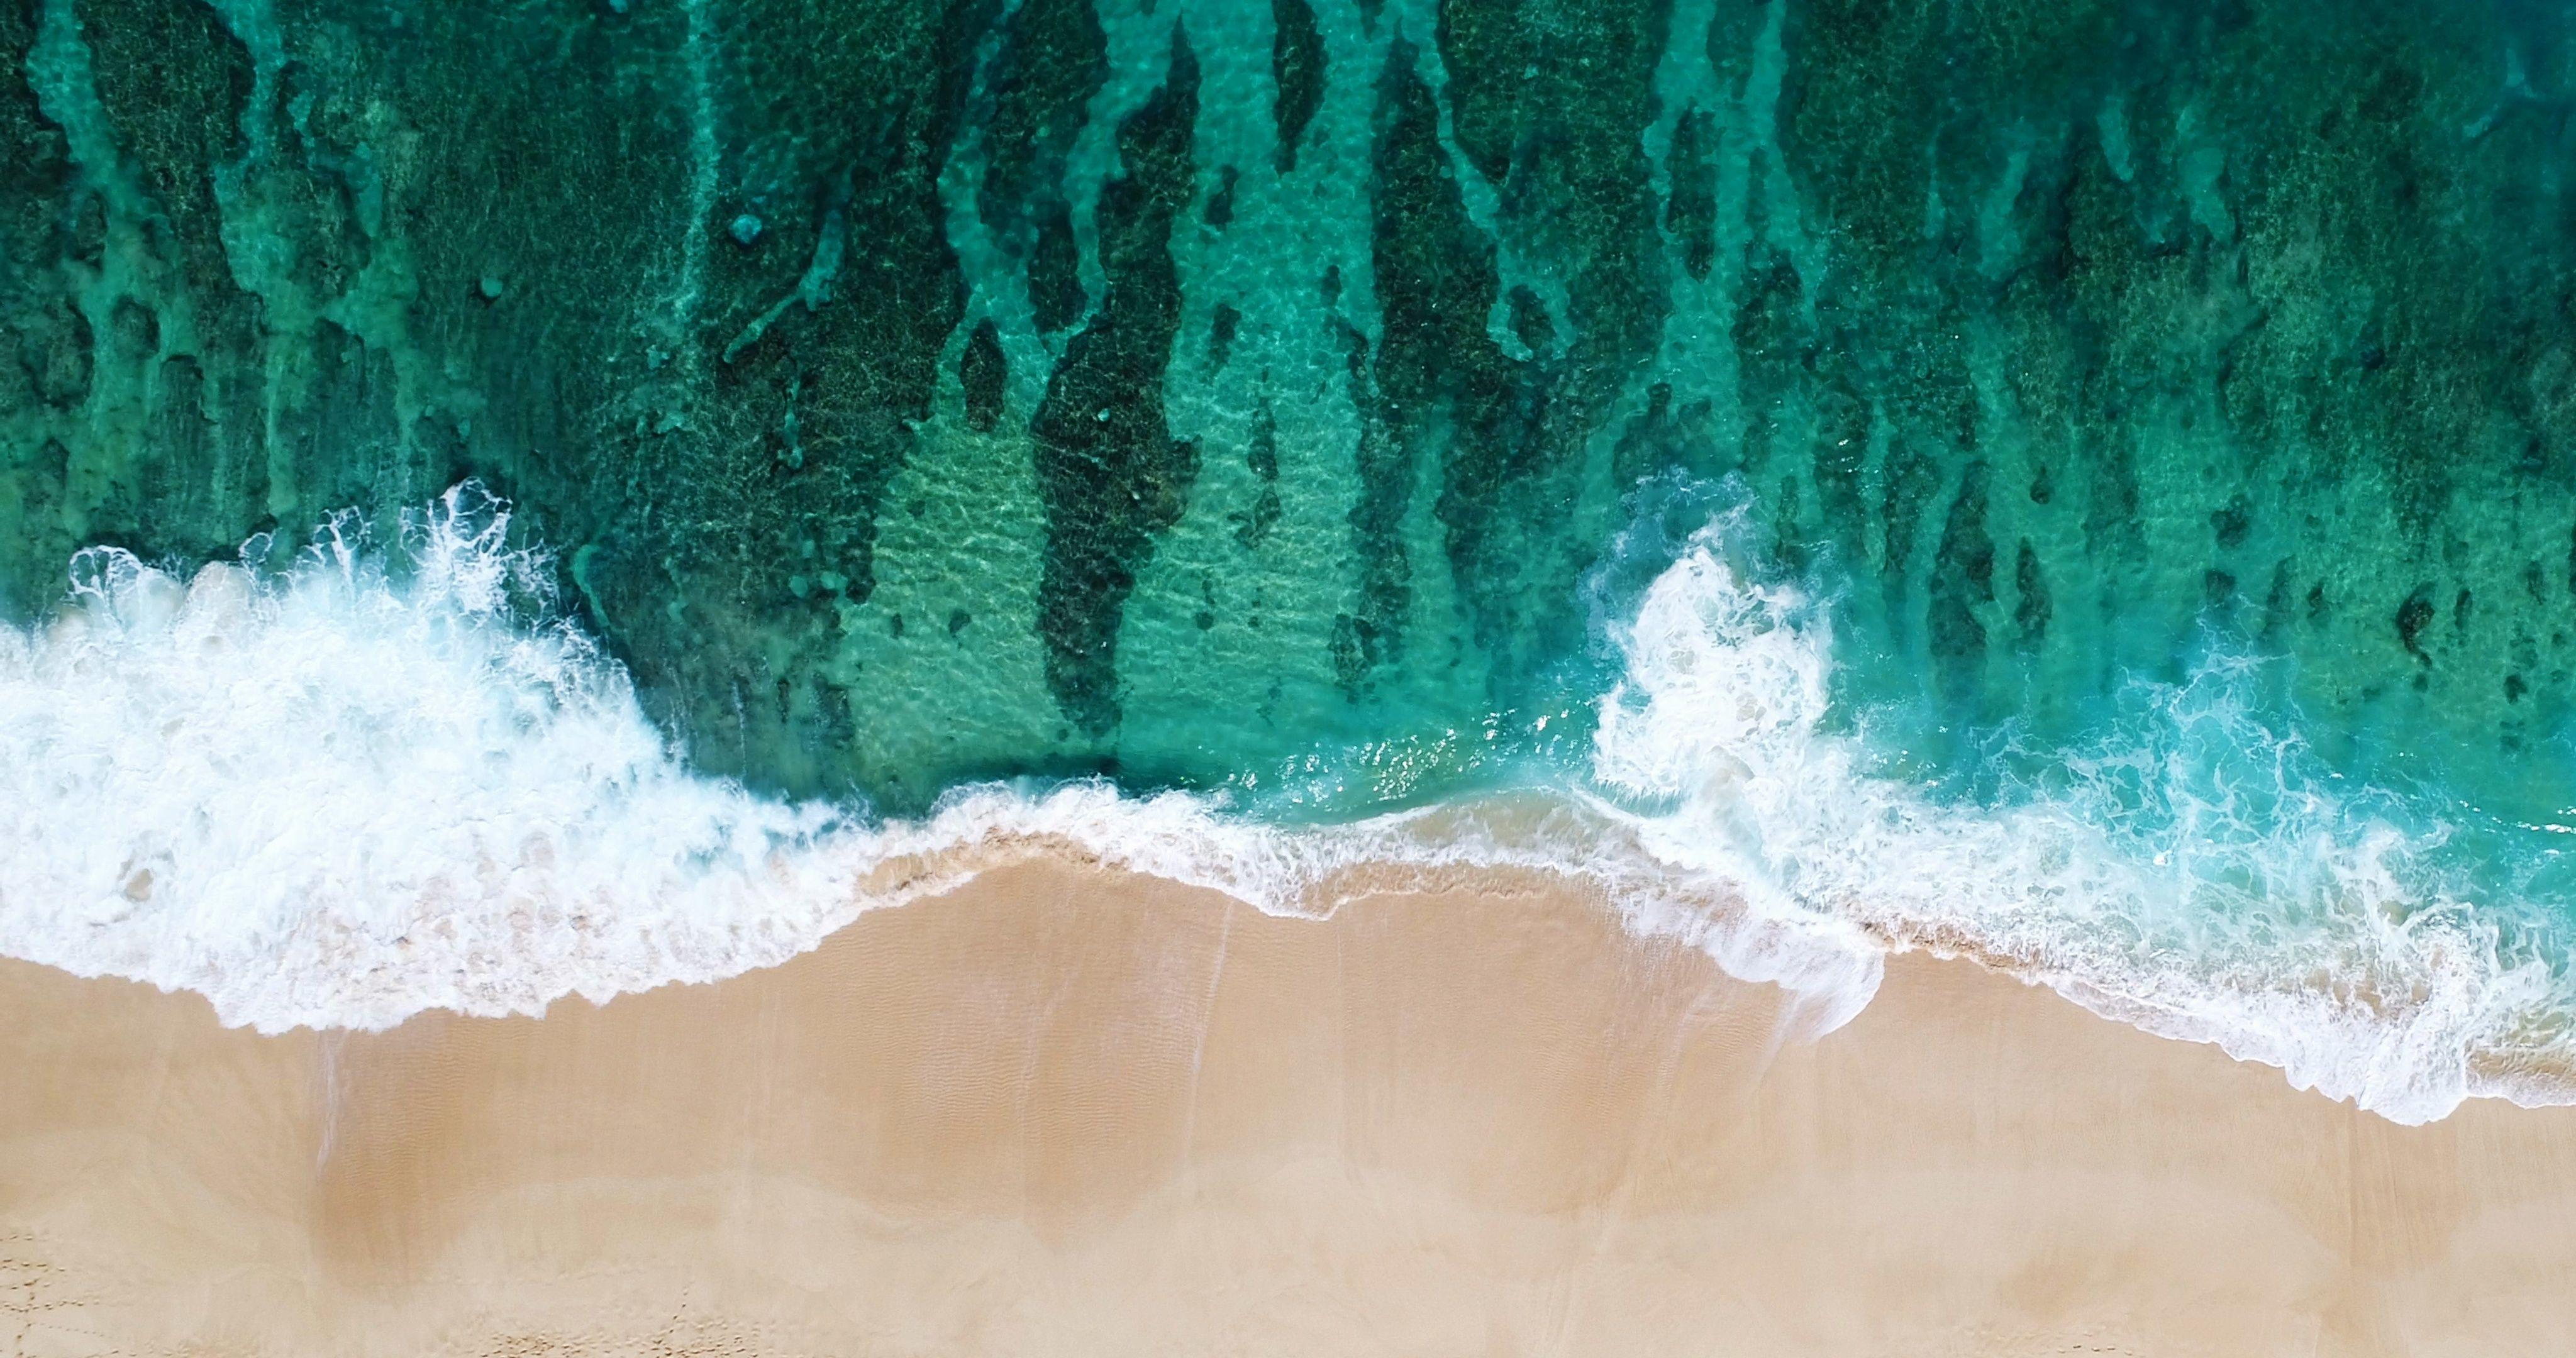 Pin By Windy Chin On Ocean Ocean Waves Aerial View Waves